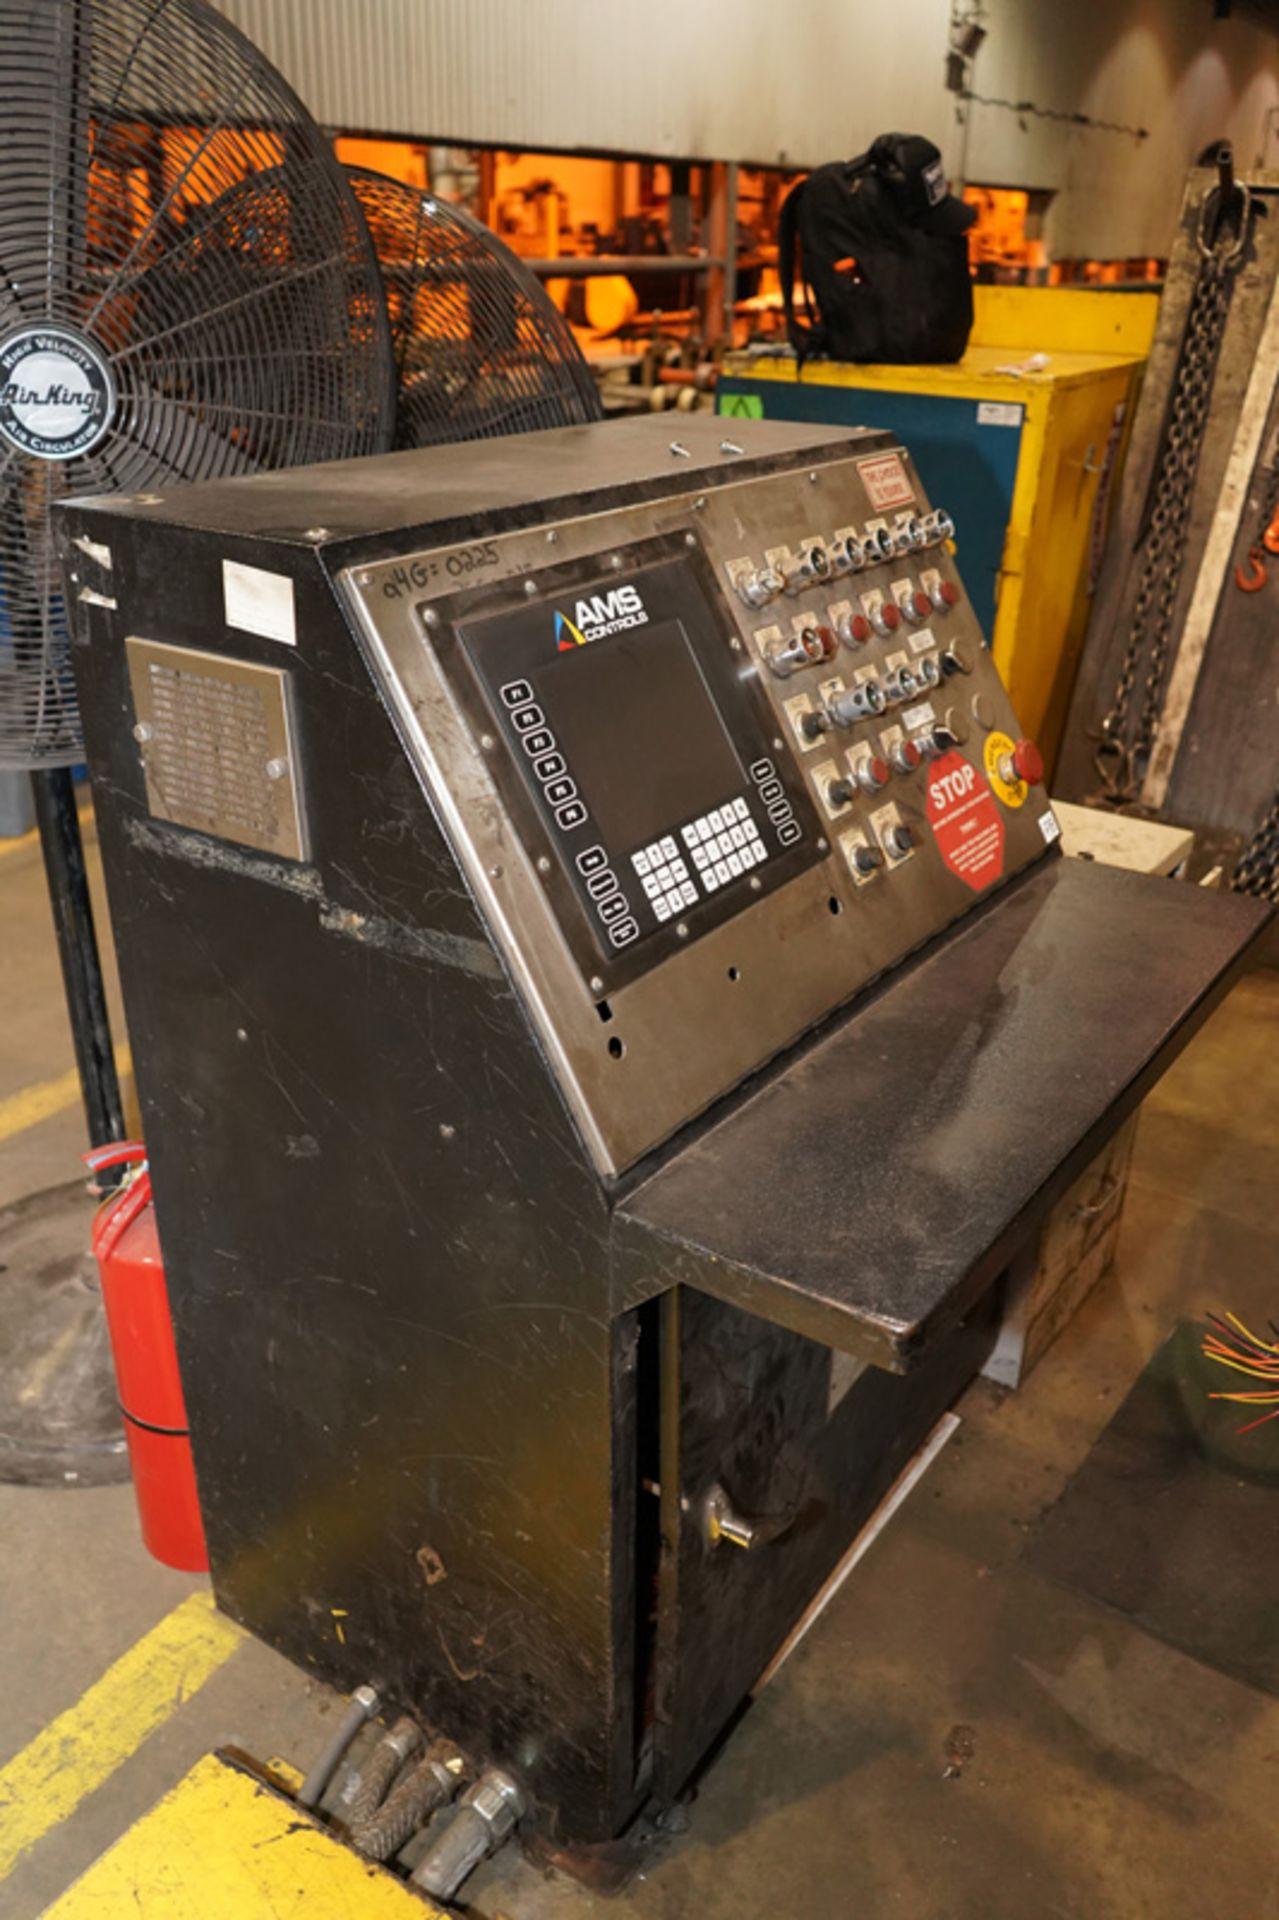 "Lot 45 - 1995 Bradbury Double High Corrugated Siding Panel Rollformer | 28 Stand x 44"" RS x 3.5"" Shaft,"